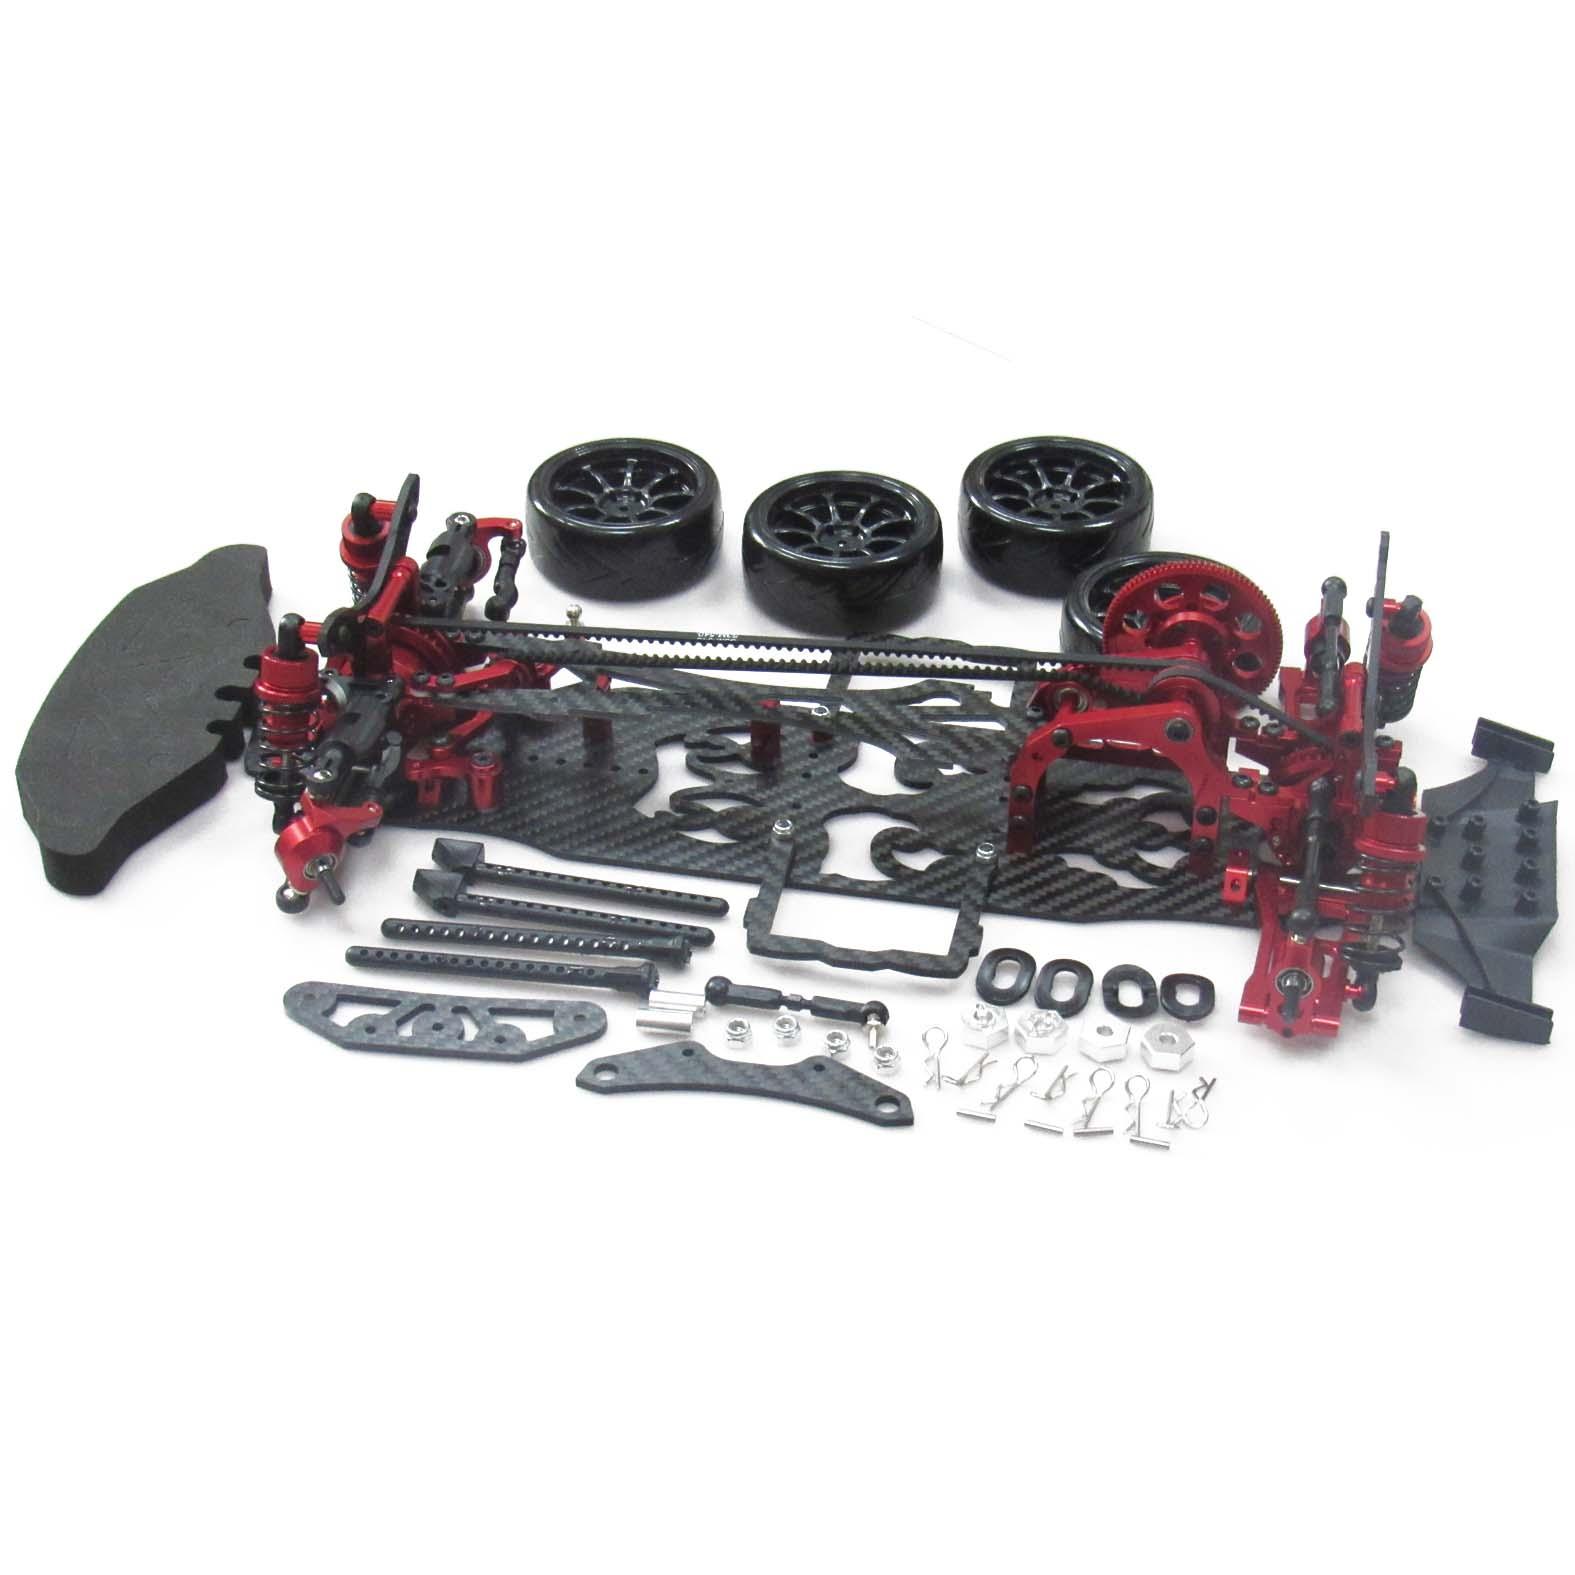 Plastics Body Post Mounts for Sakura  D4 D3-XI 1:10 RC Upgrade Racing Car Parts